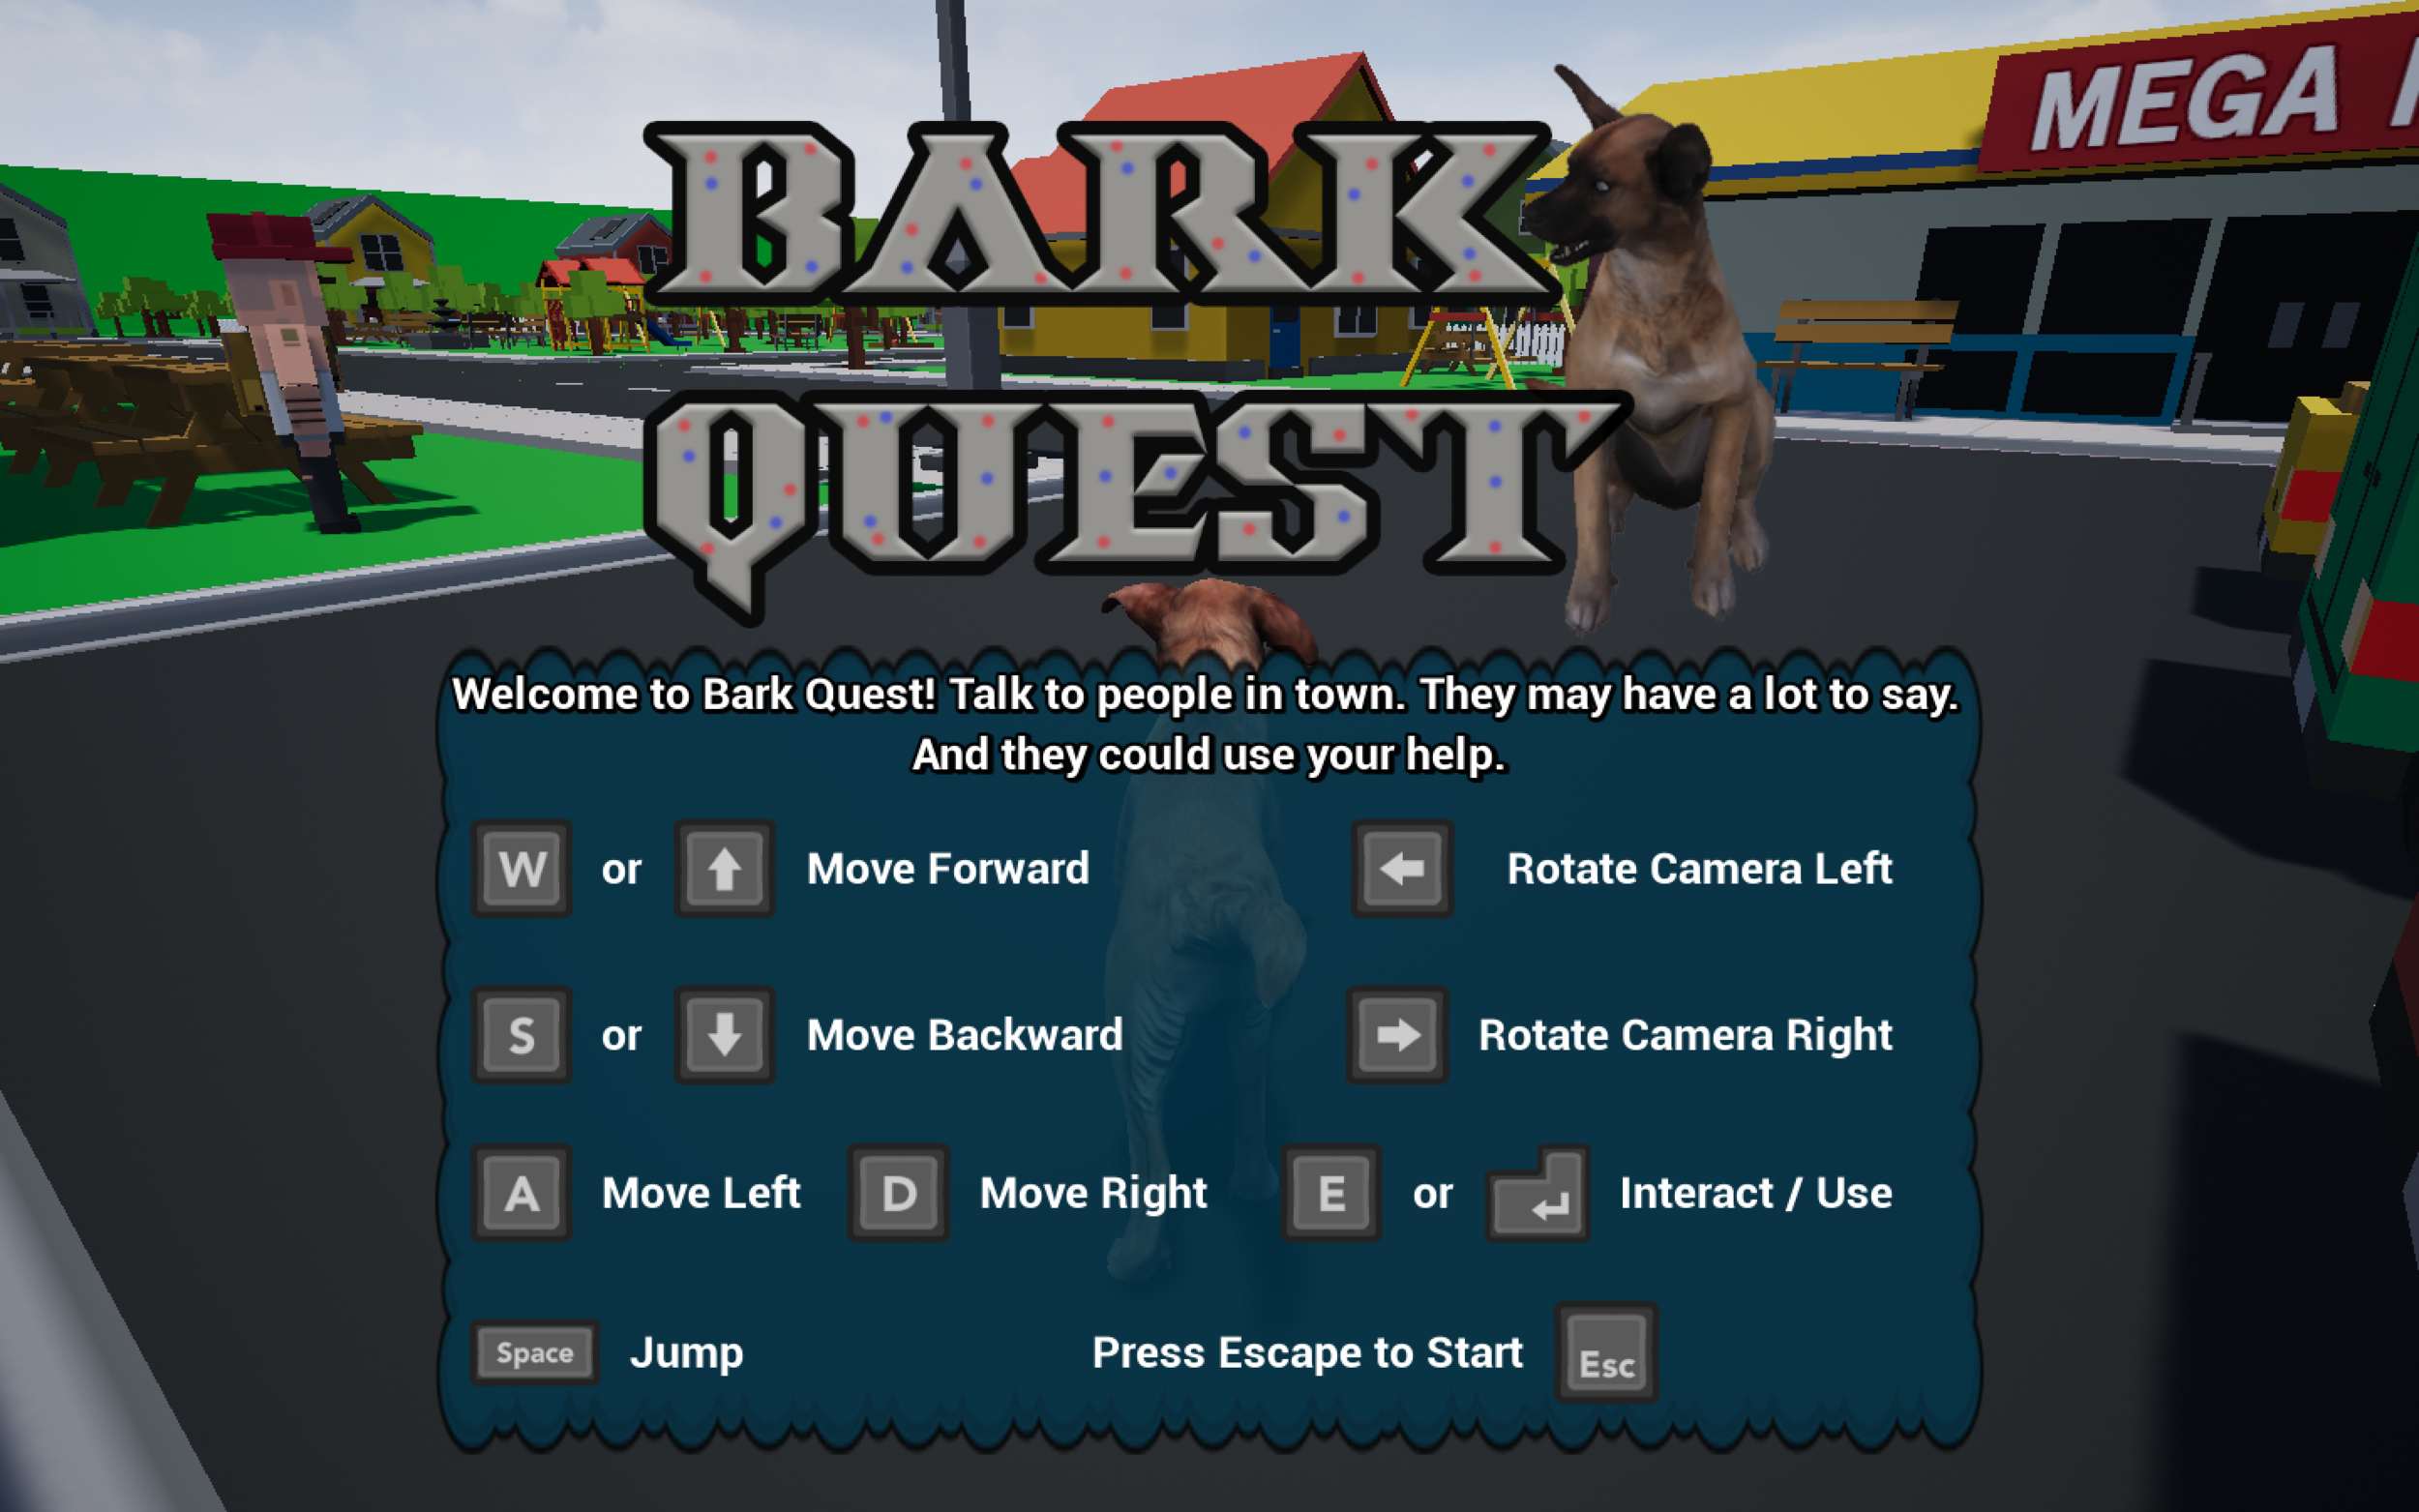 Bark Quest